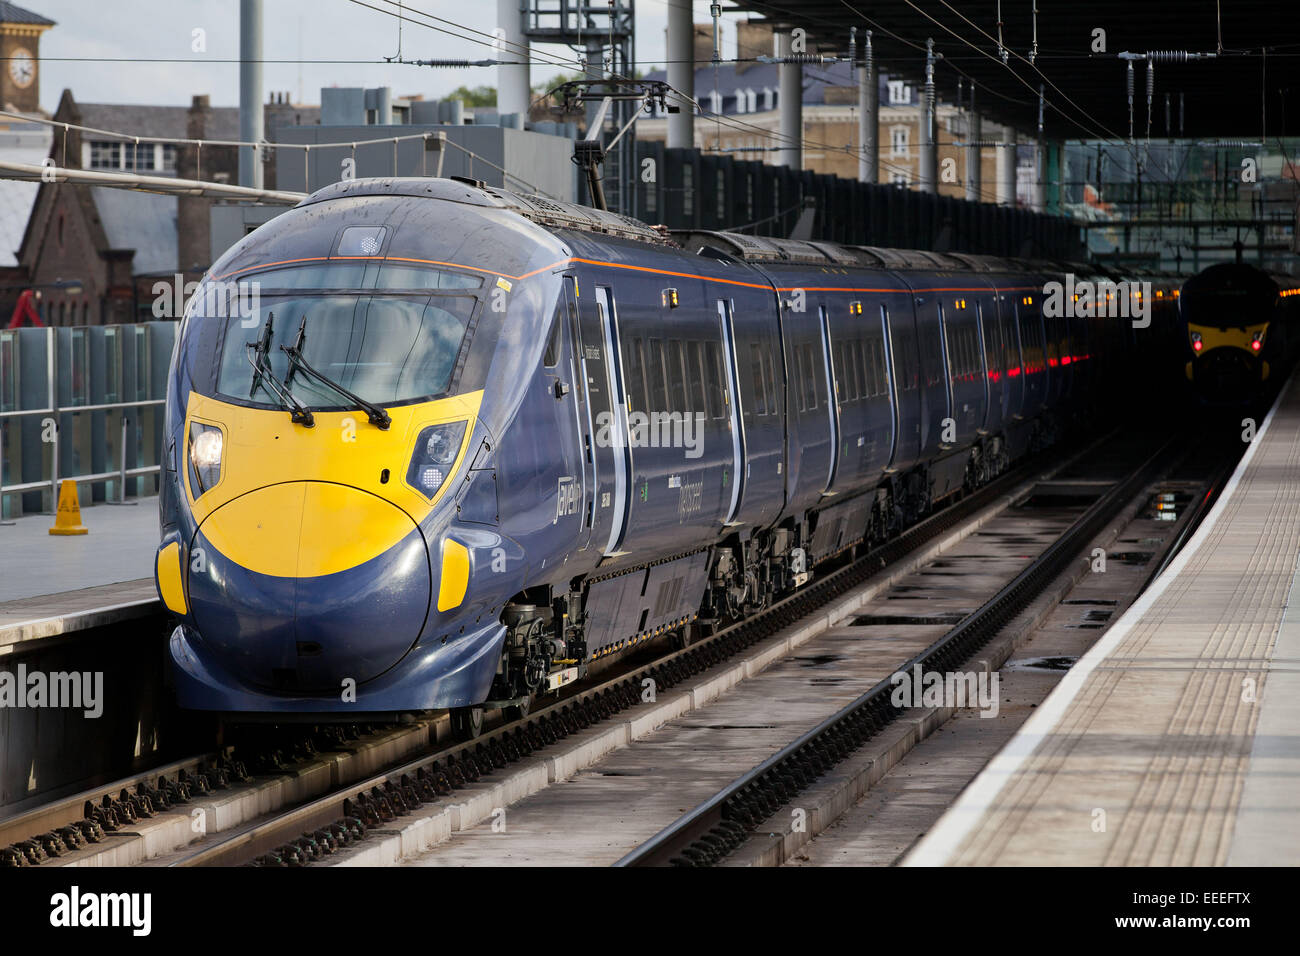 Class 395 Southeastern train at the platforms at St. Pancras Internaitonal station - Stock Image